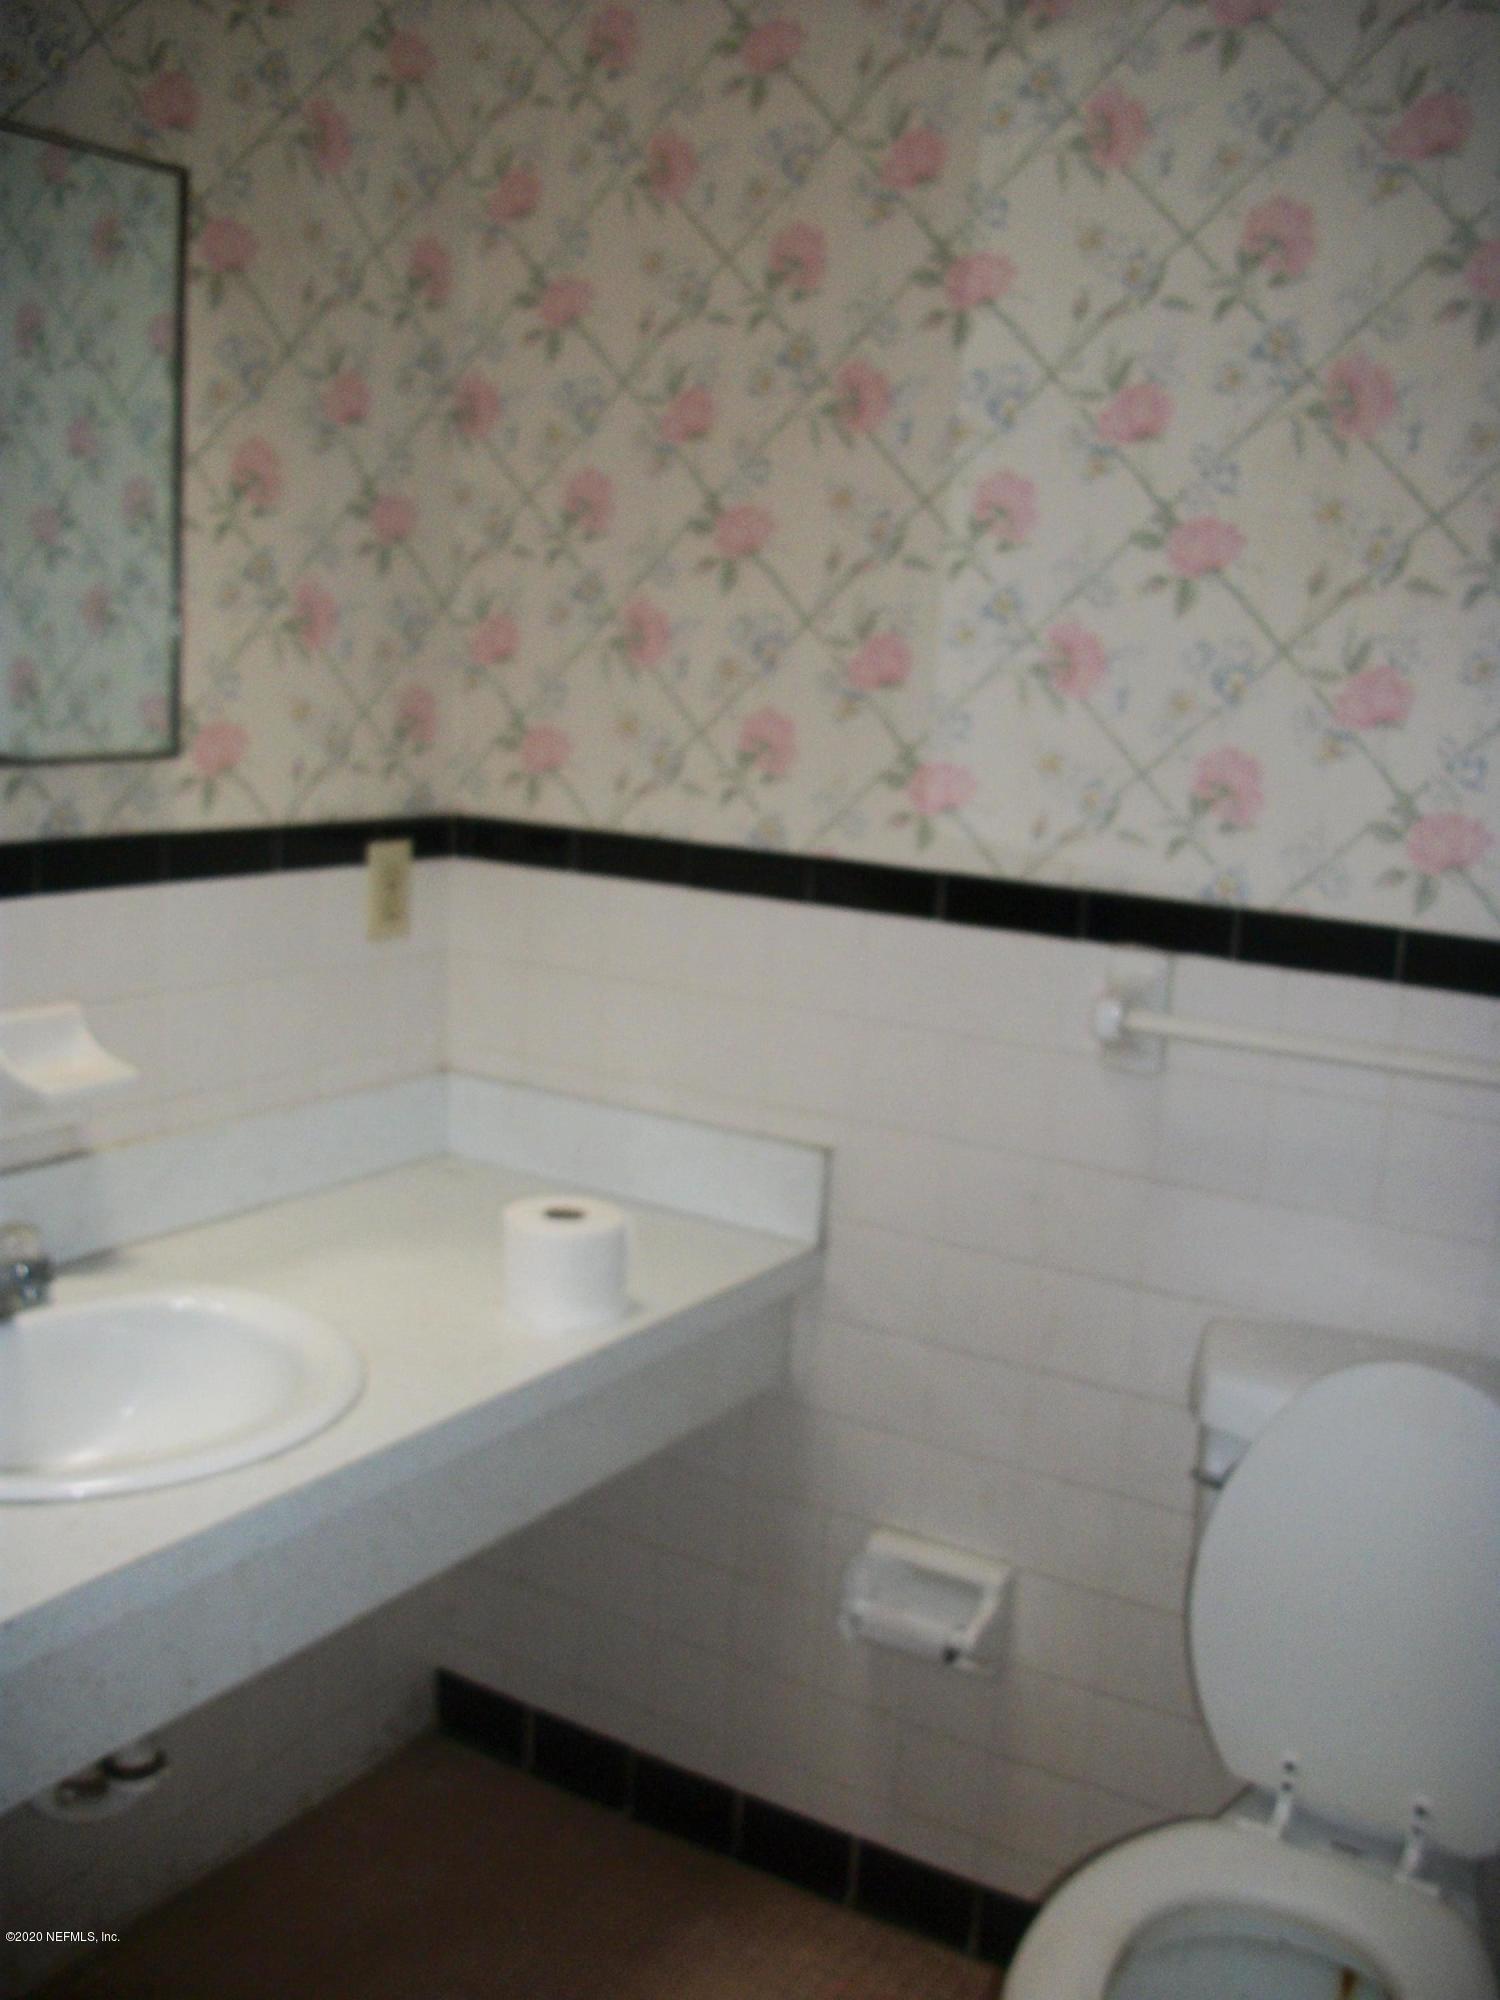 5356 TUBMAN, JACKSONVILLE, FLORIDA 32219, 3 Bedrooms Bedrooms, ,2 BathroomsBathrooms,Residential,For sale,TUBMAN,1081278